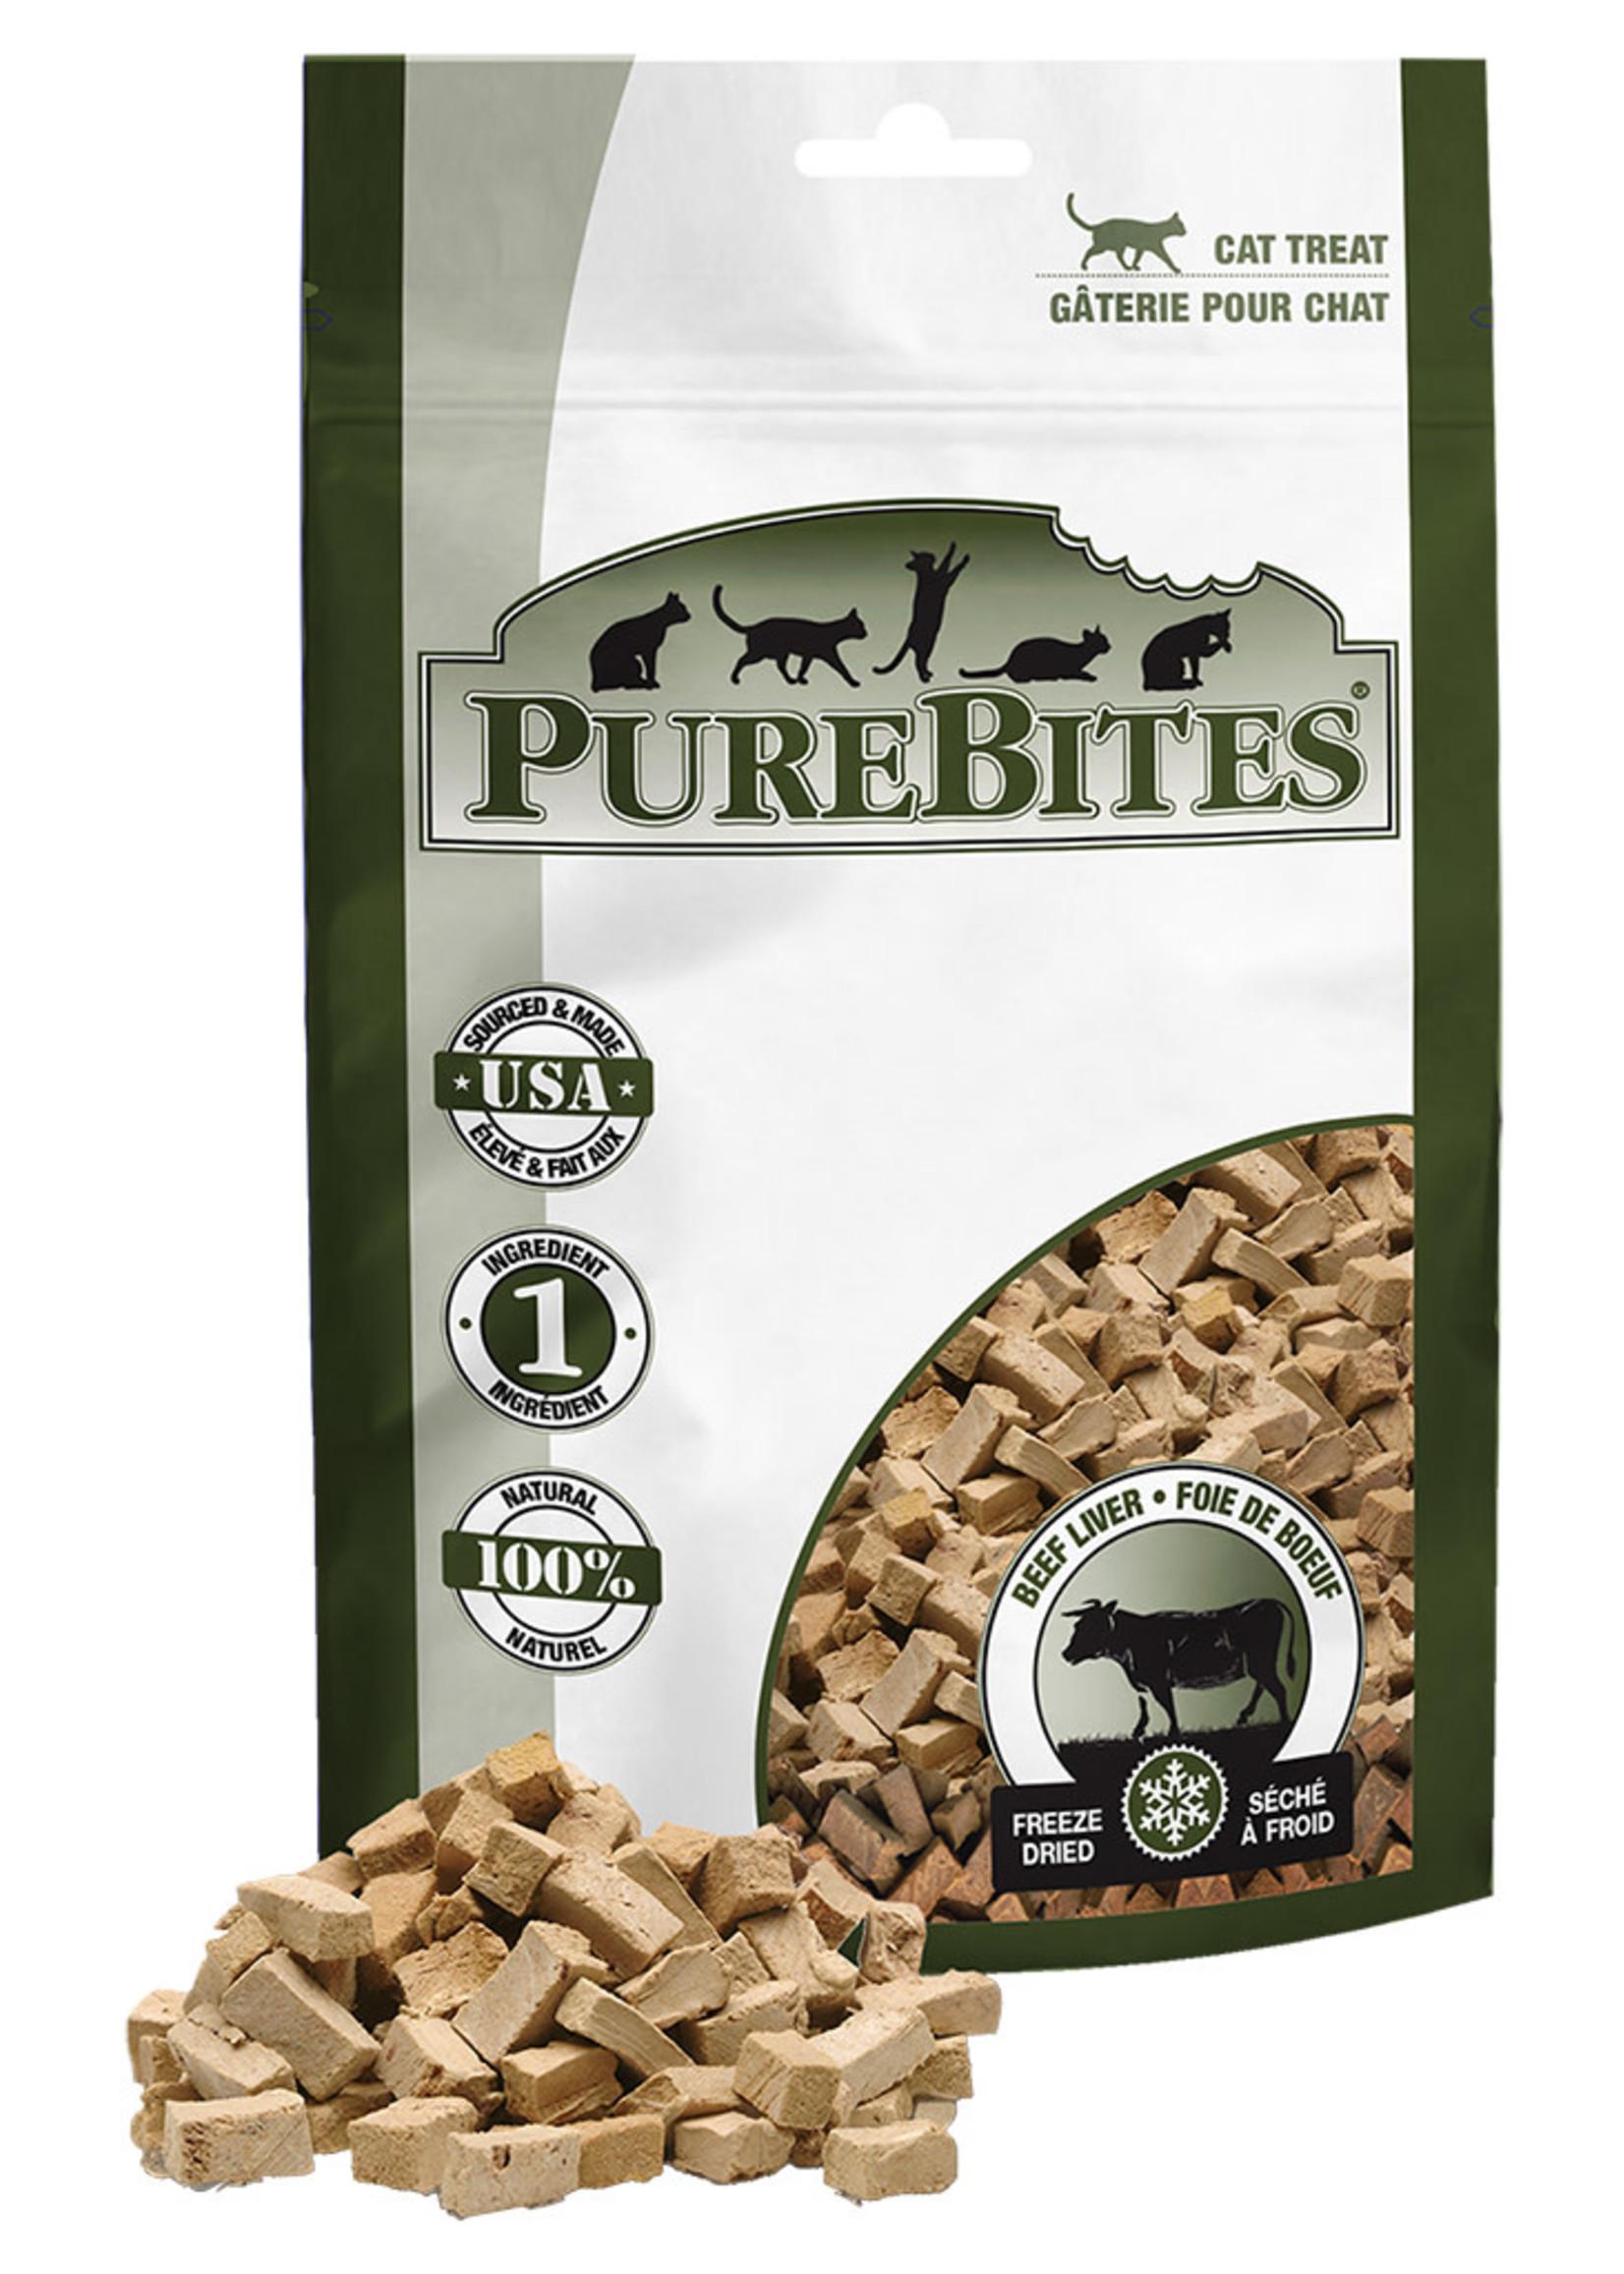 PUREBITES Beef Liver Cat Treat - 24GM